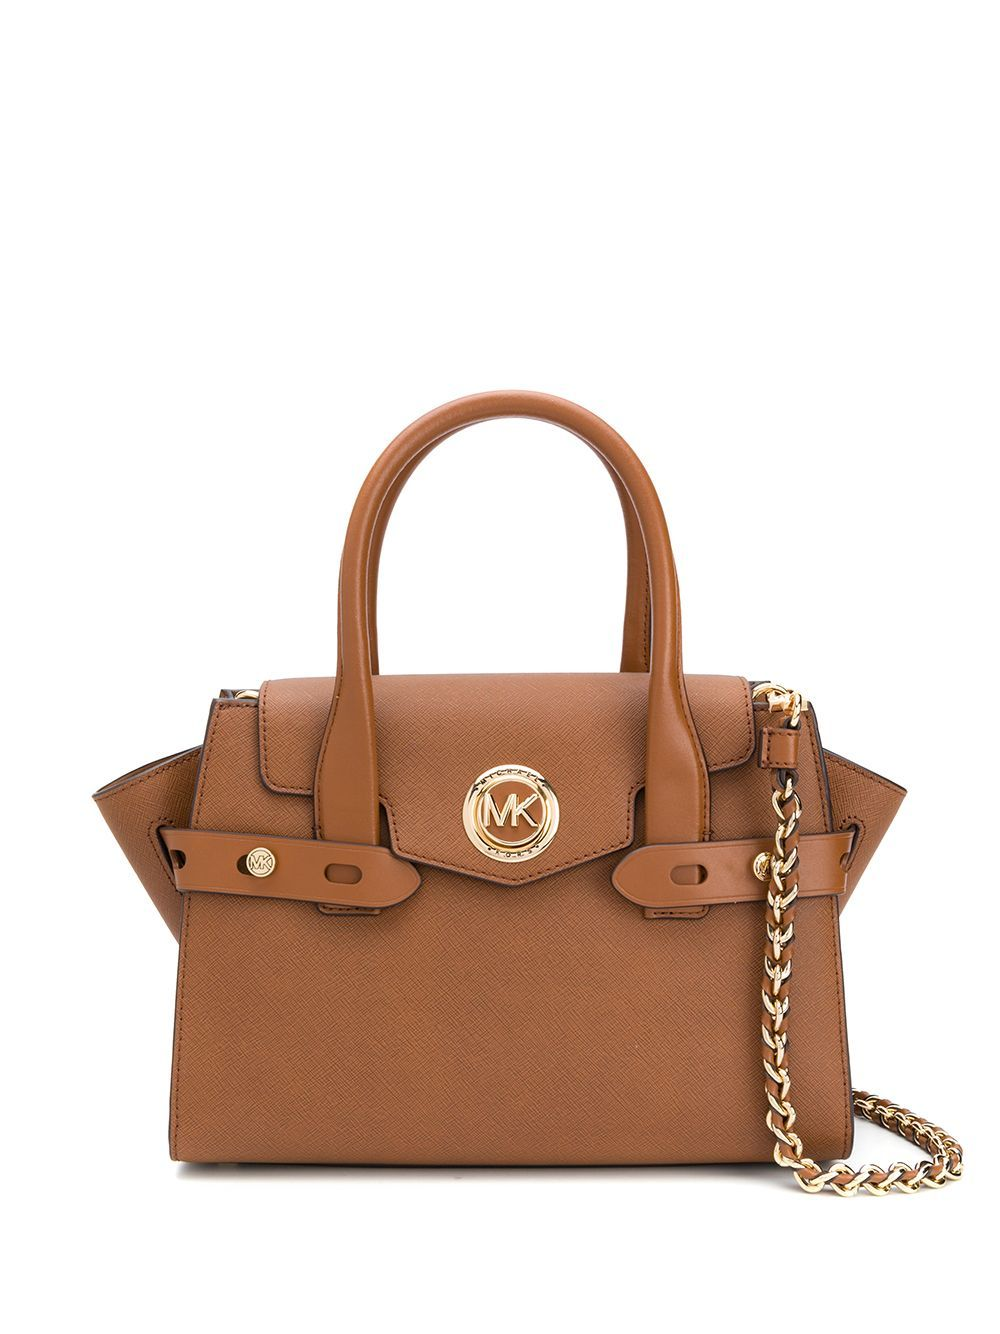 Carmen leather handbag